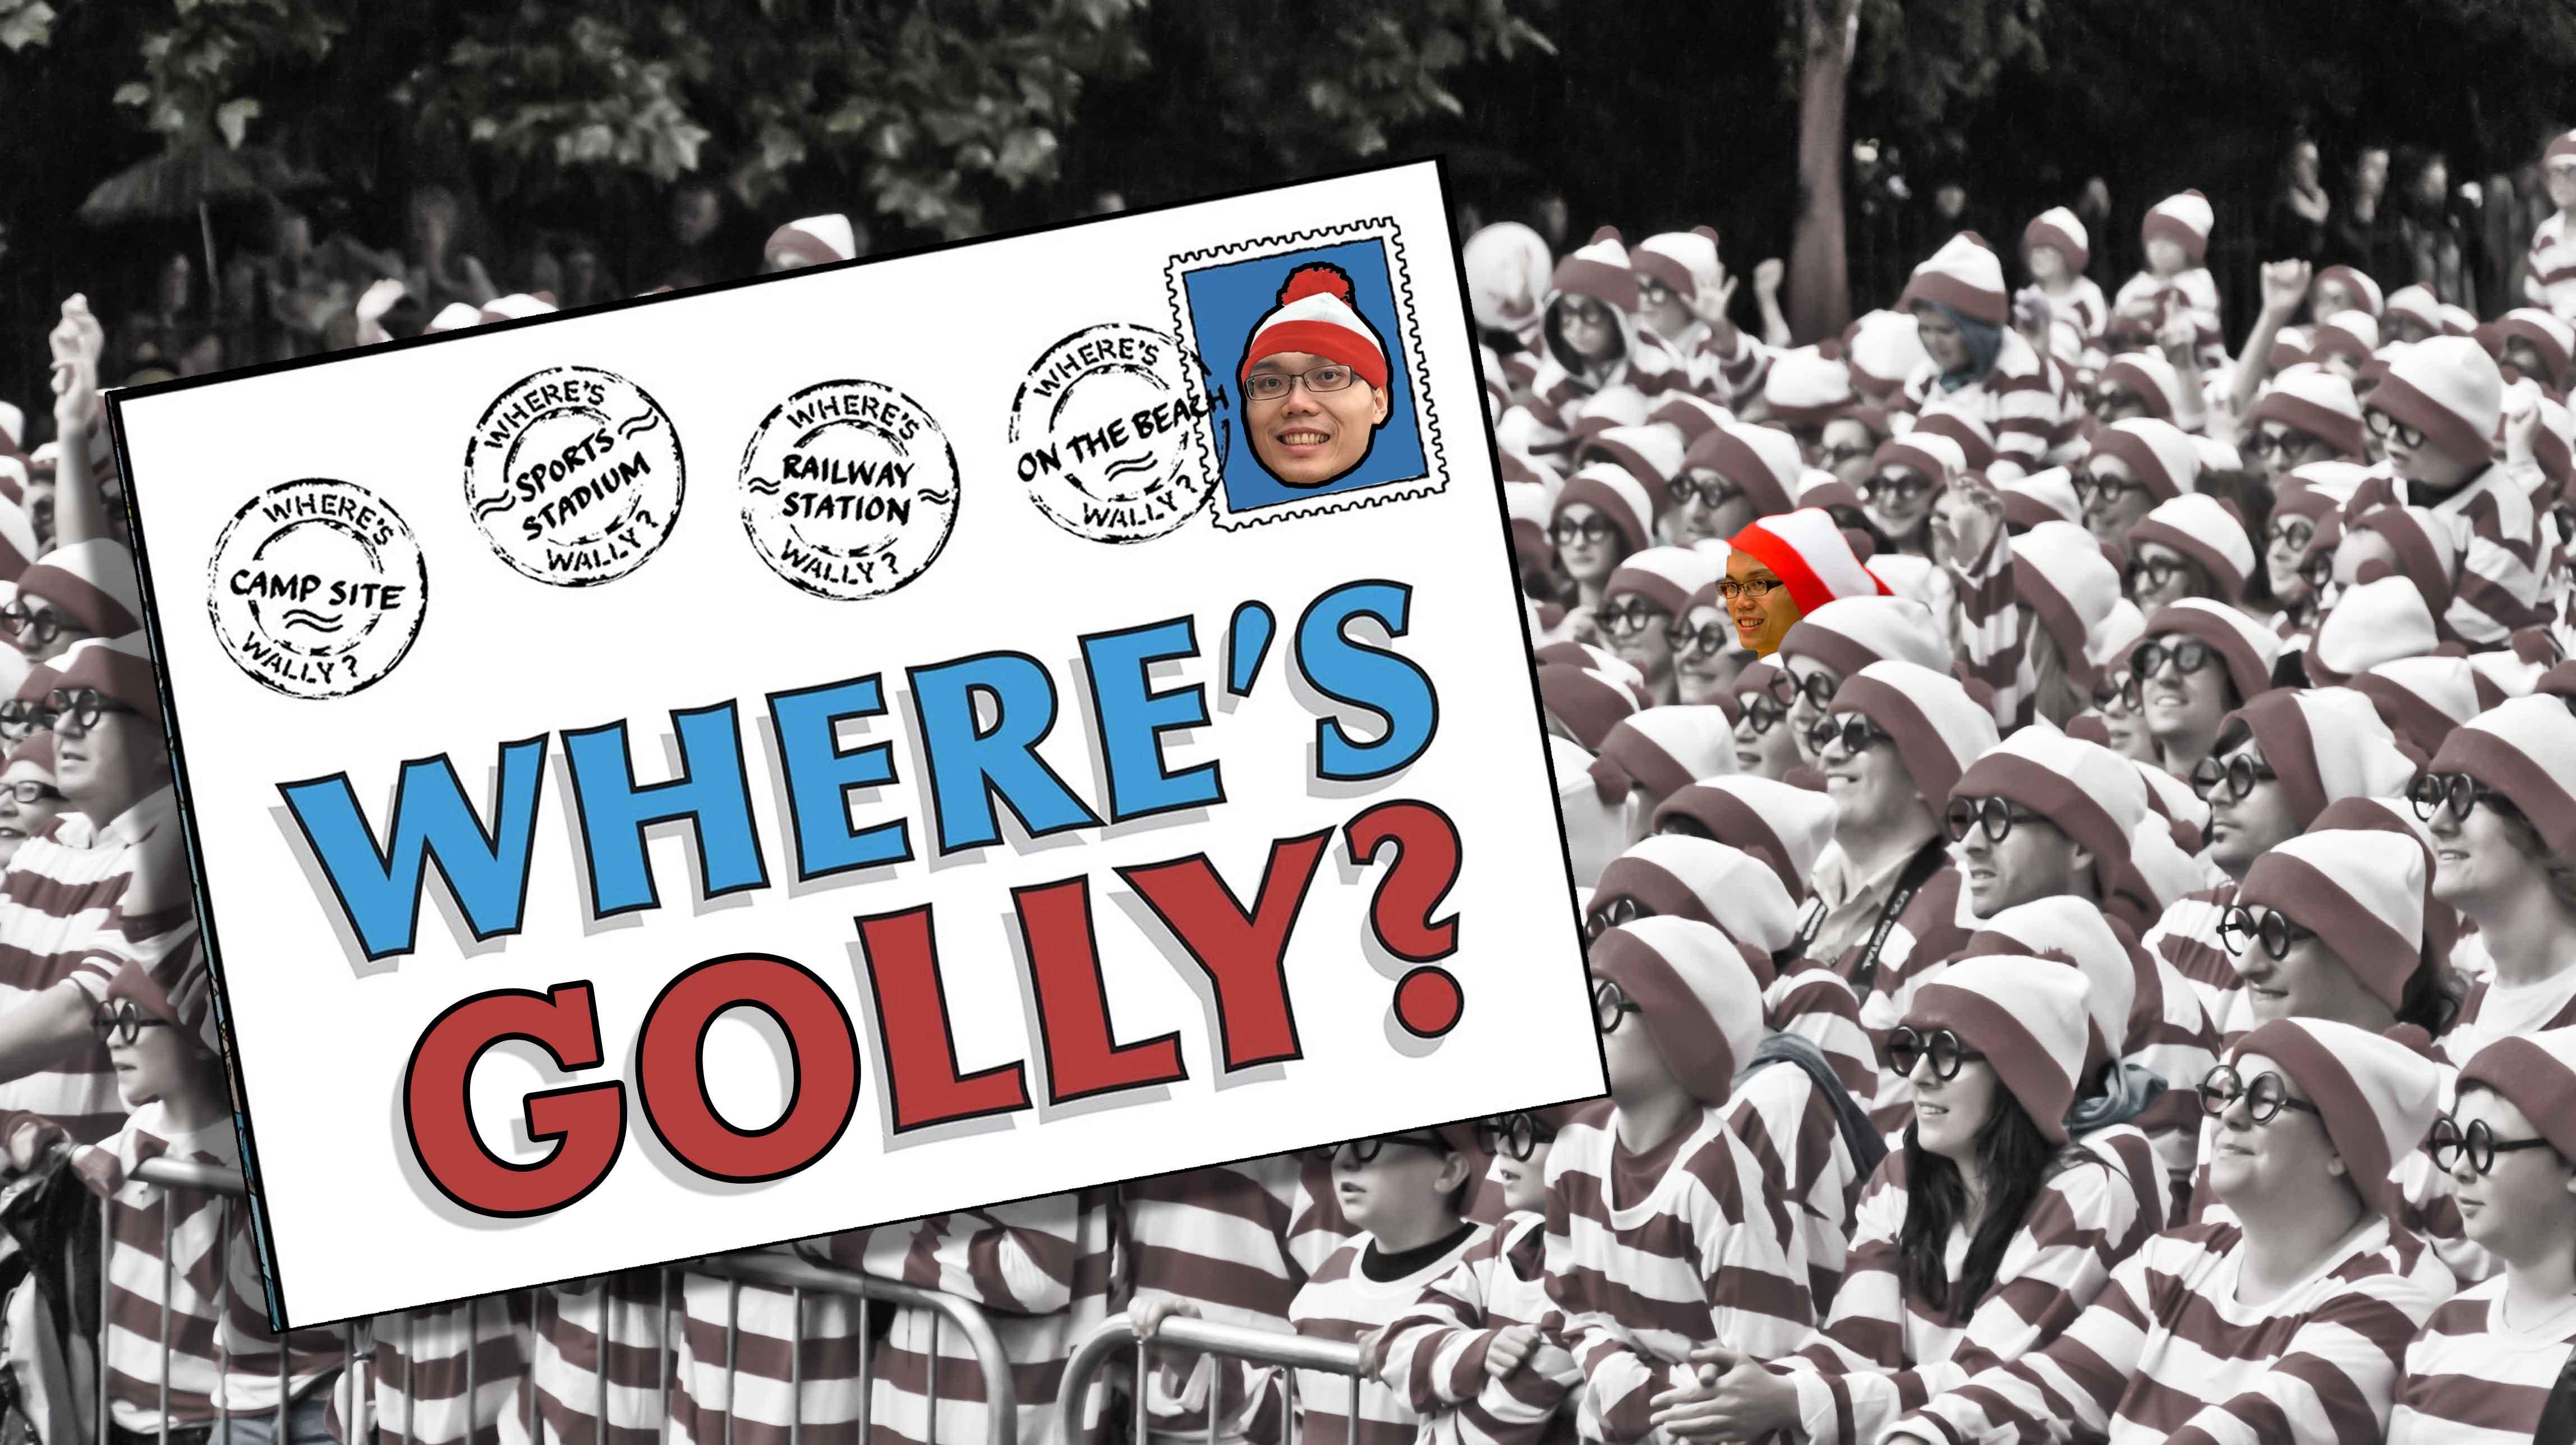 Where's_Golly_talenox